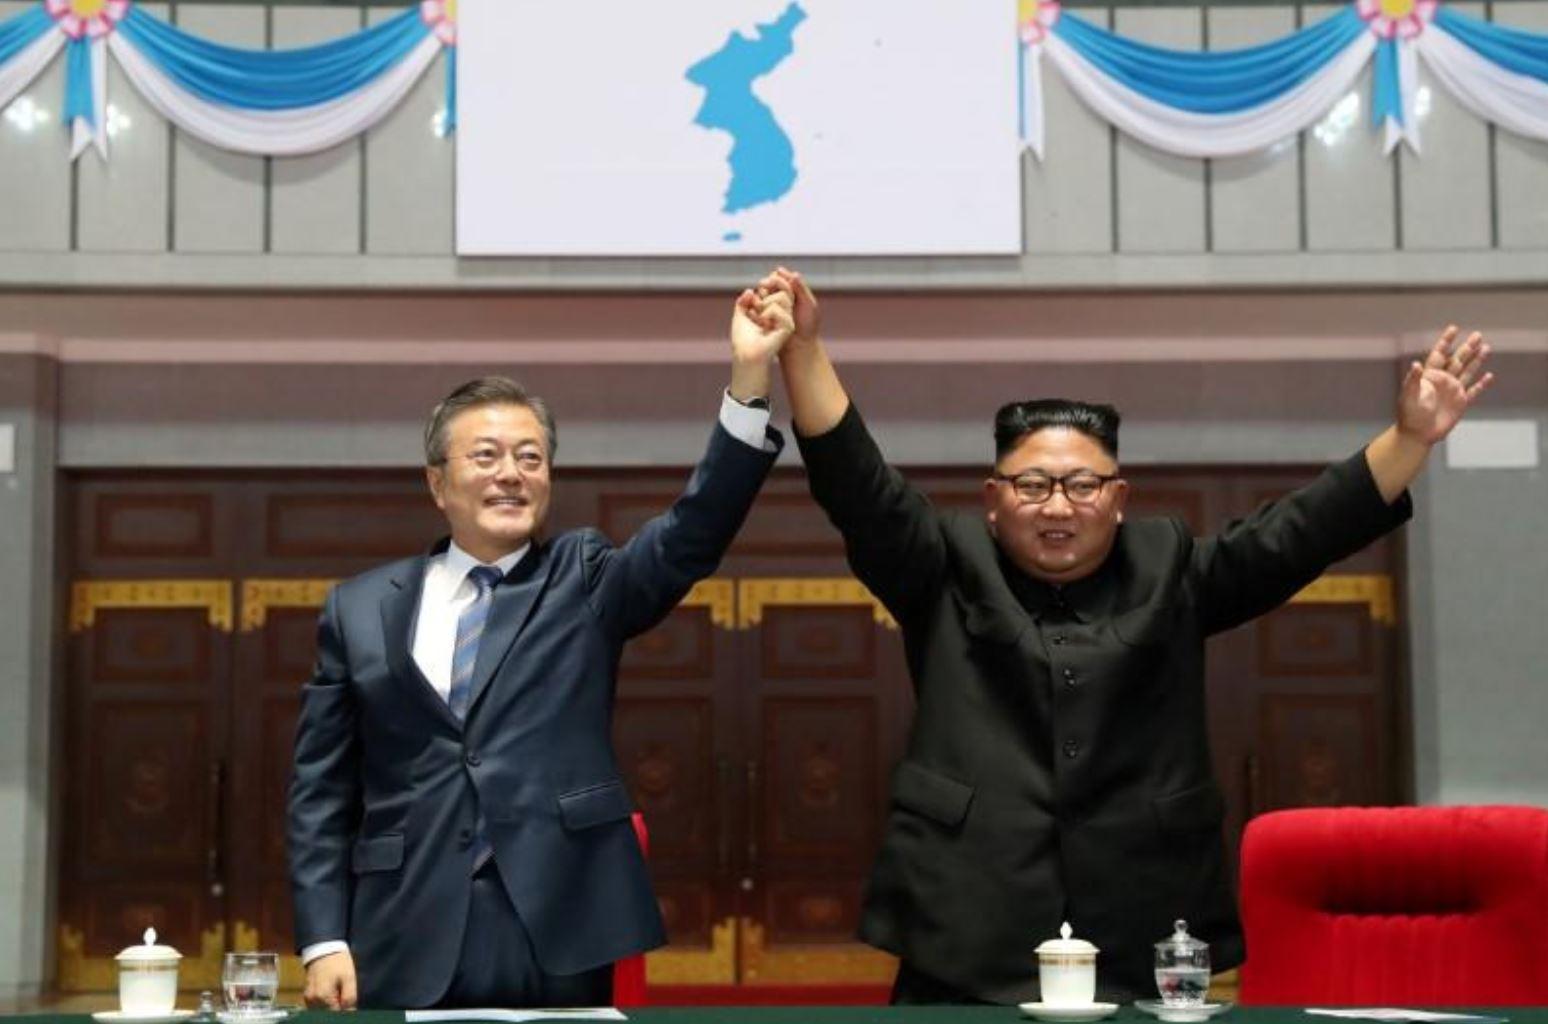 Hasil gambar untuk North and South Korea agree to scrap 22 guard posts at border next month